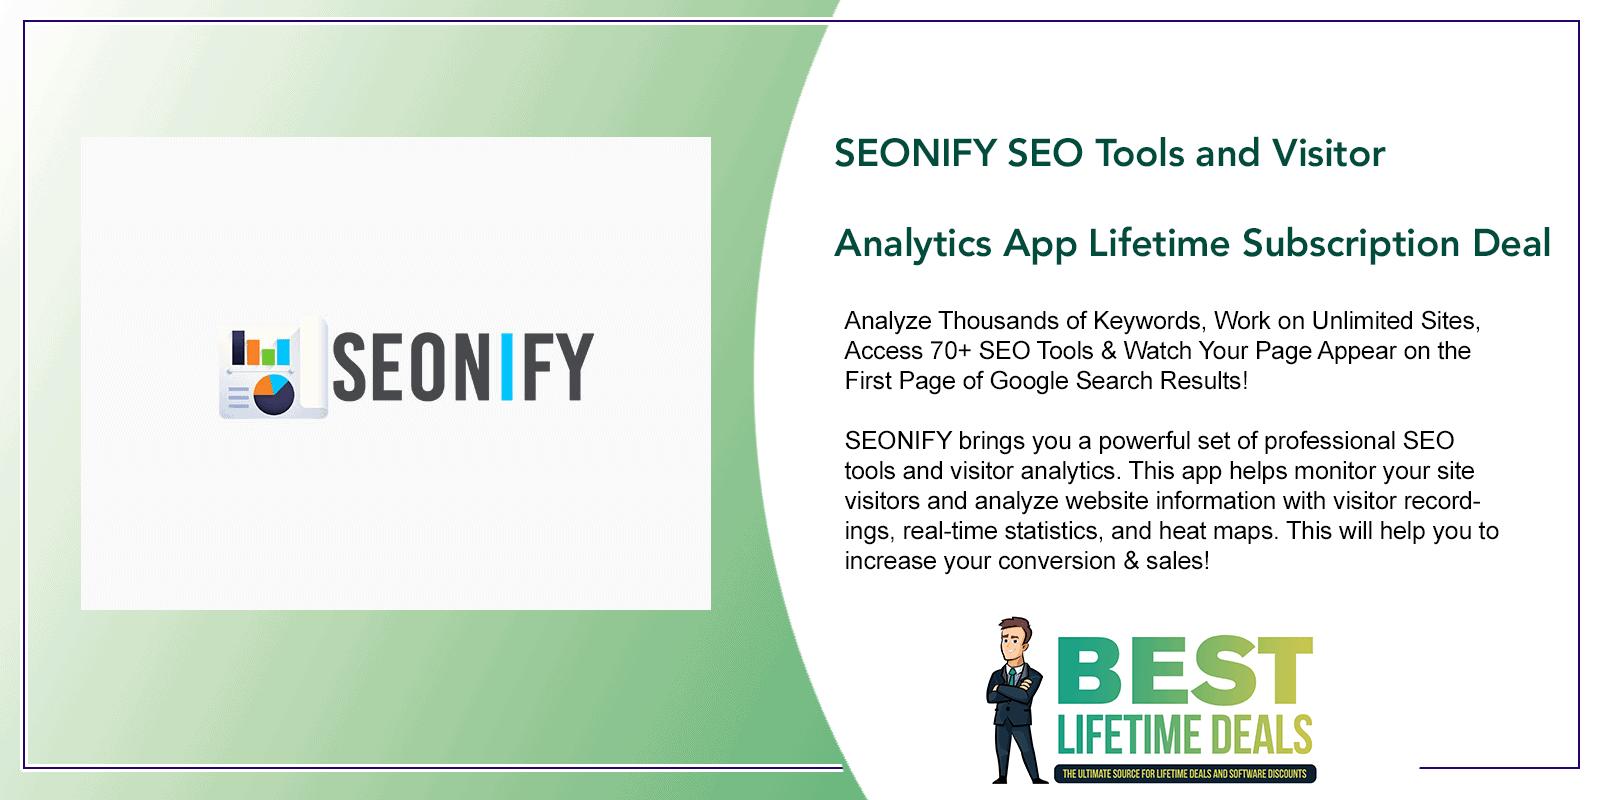 SEONIFY SEO Tools Featured Image